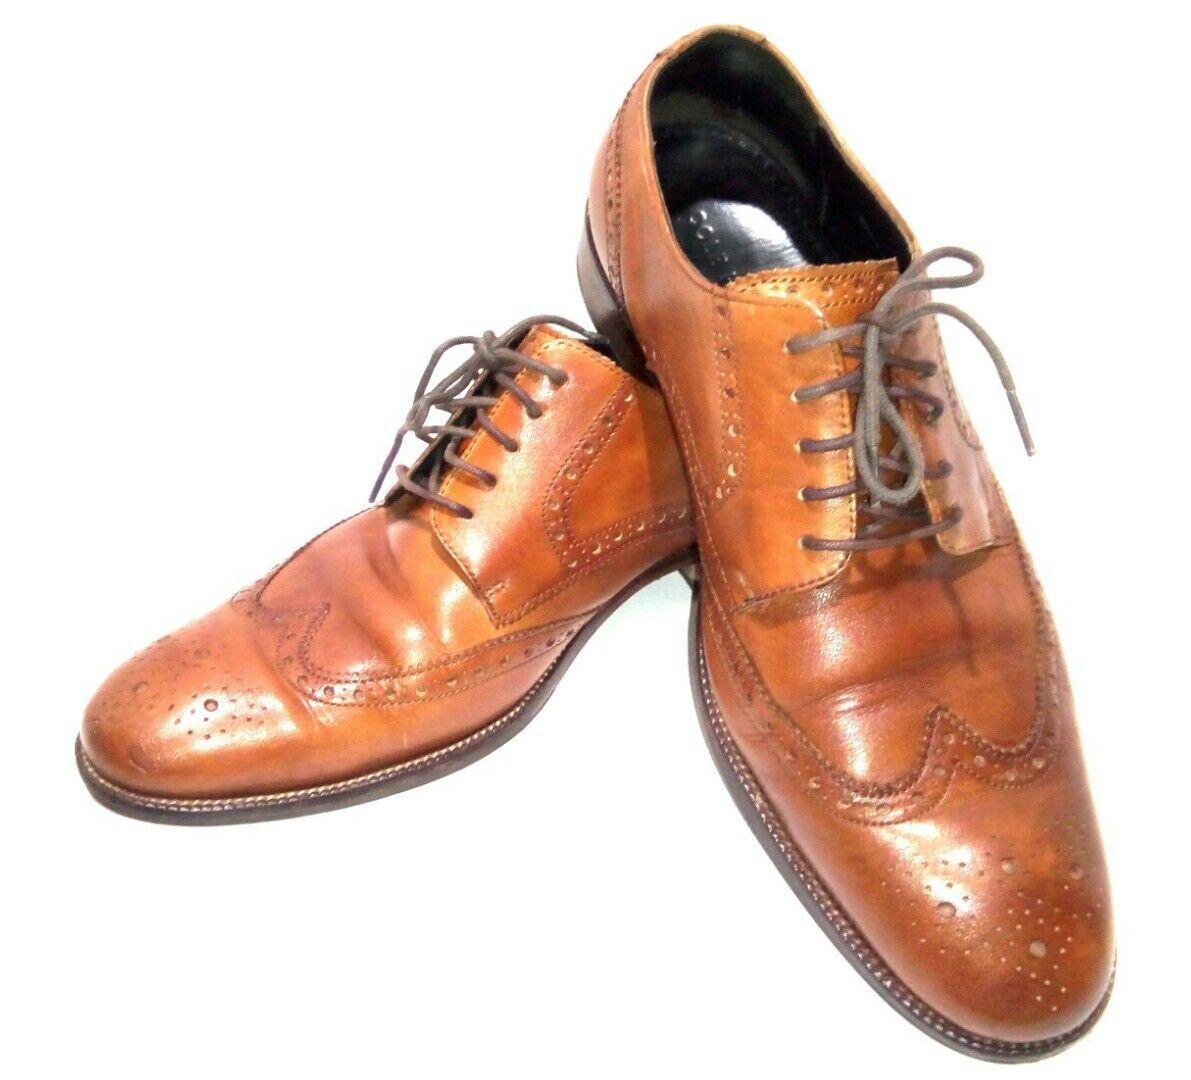 Cole Haan Men's 10M British Tan Benton Wingtip Oxfords Dress Work shoes C24116